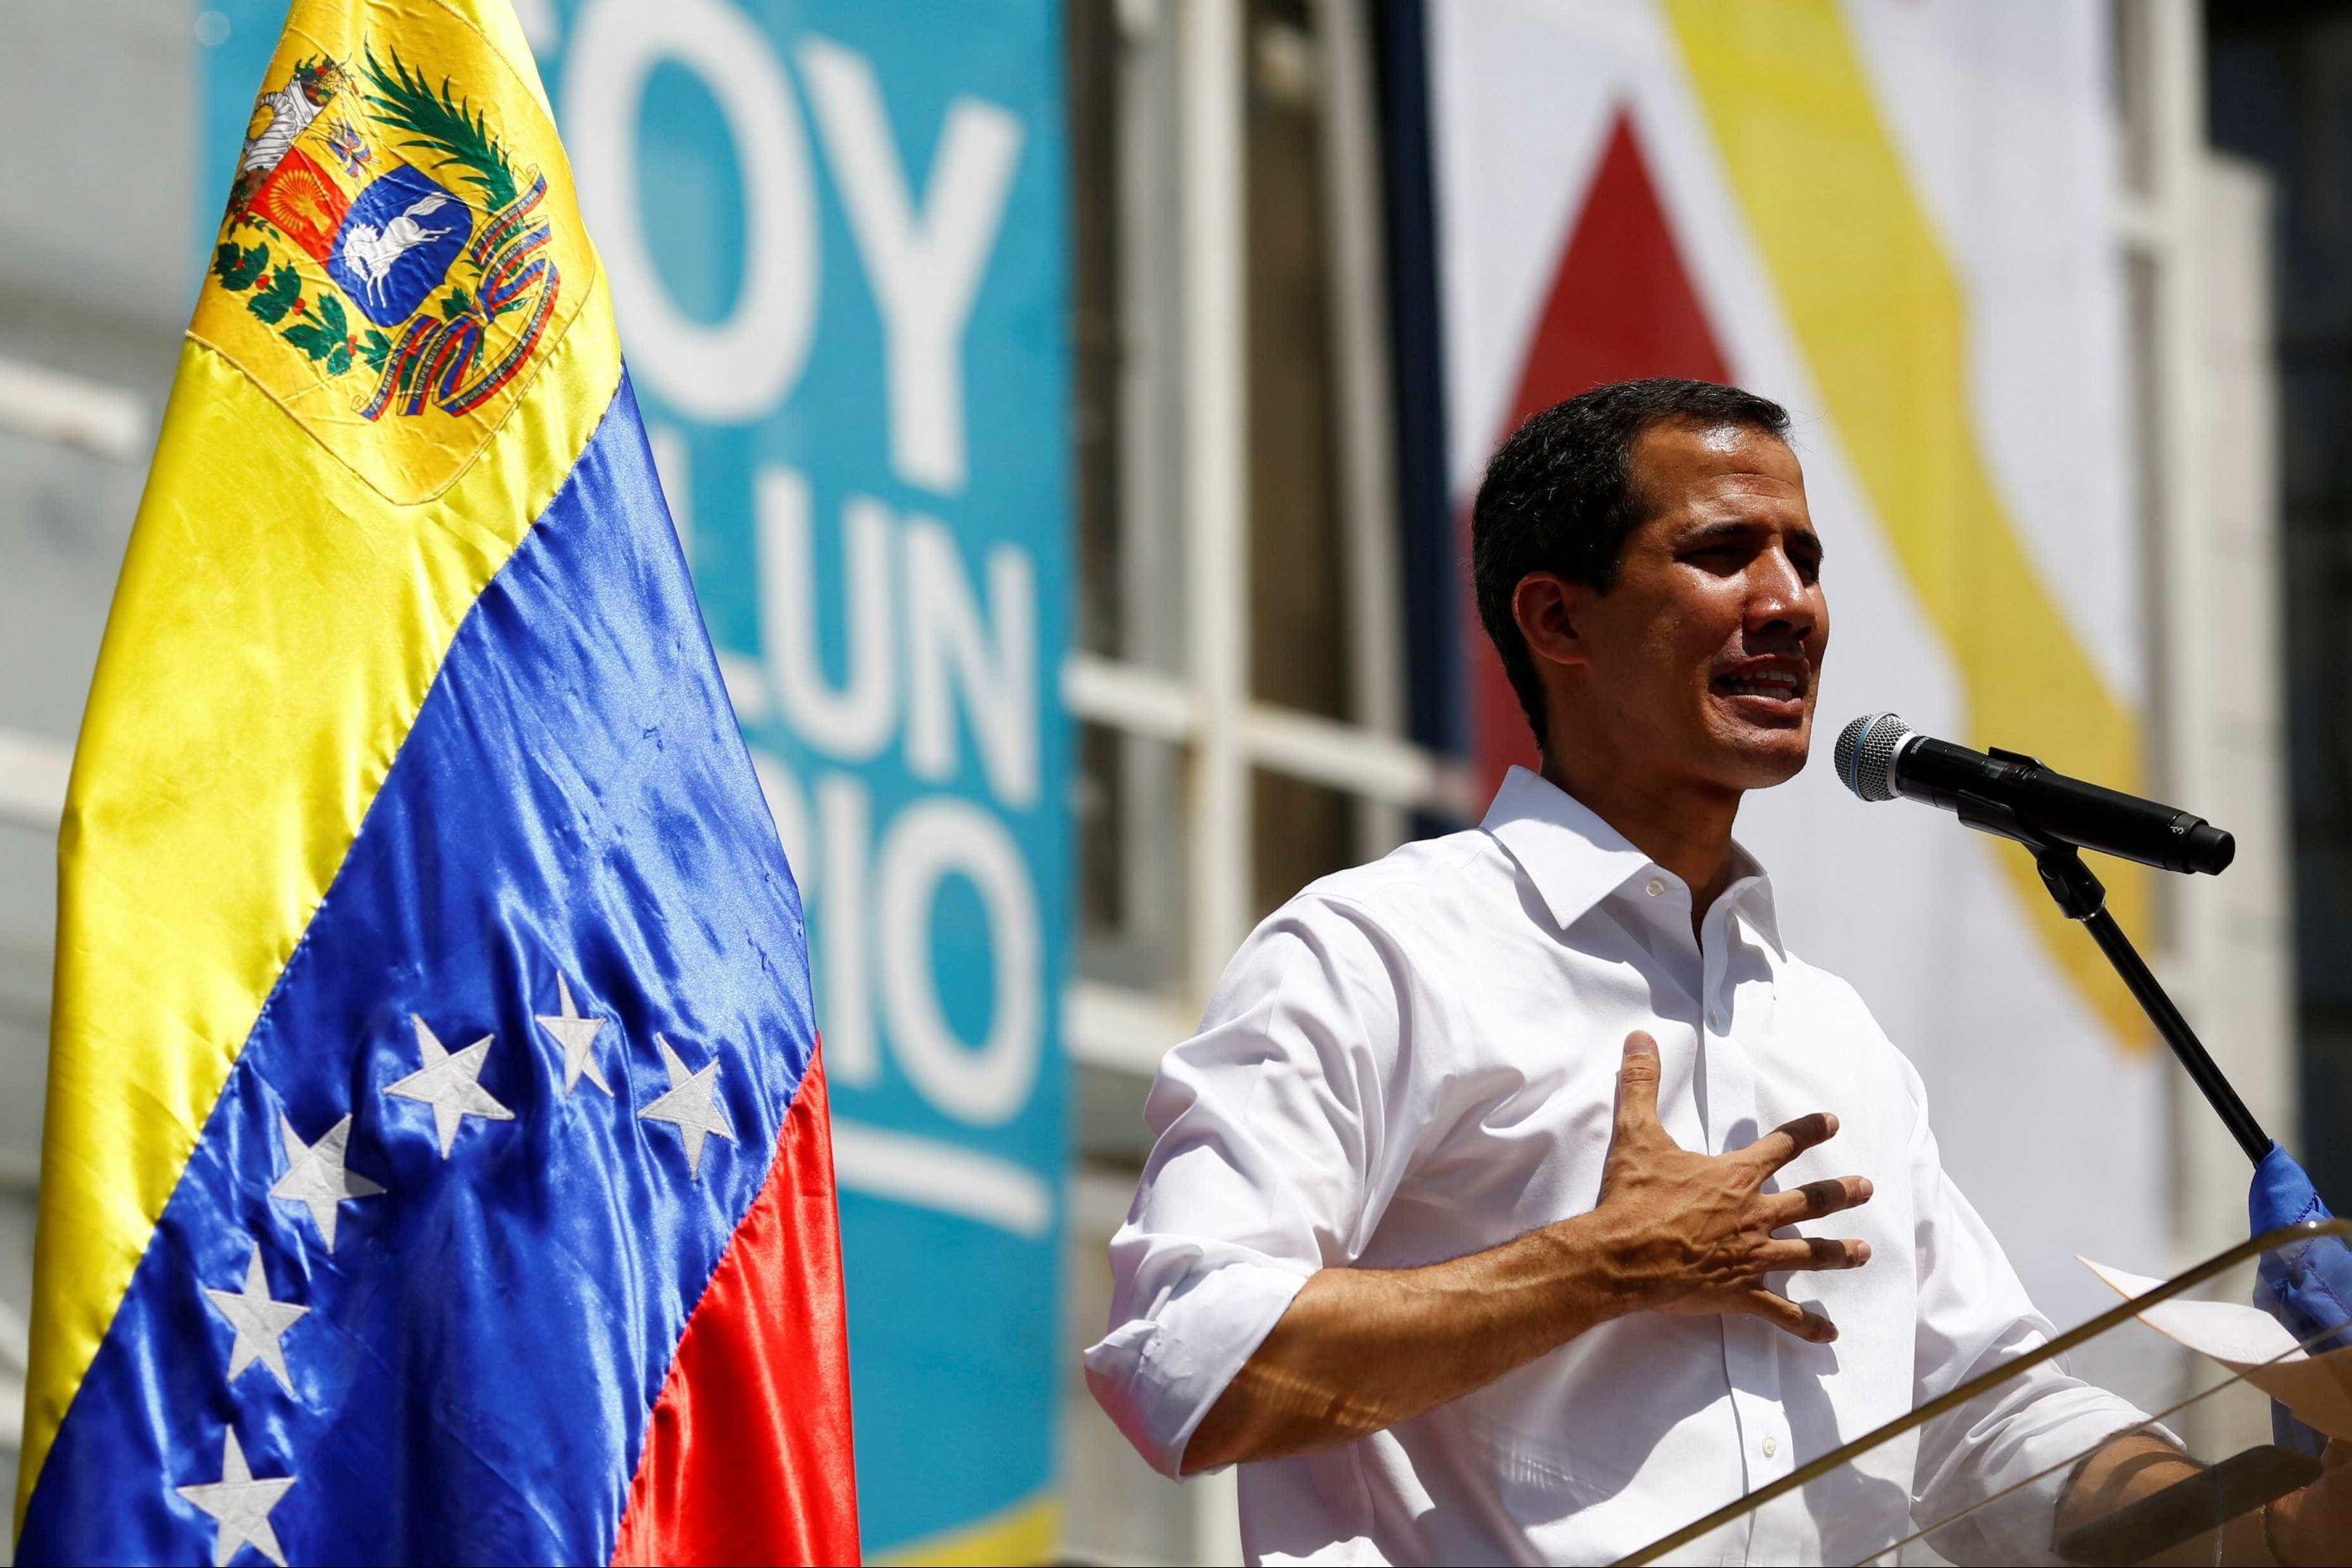 Representante de Guaidó descarta retirada da Venezuela da OEA